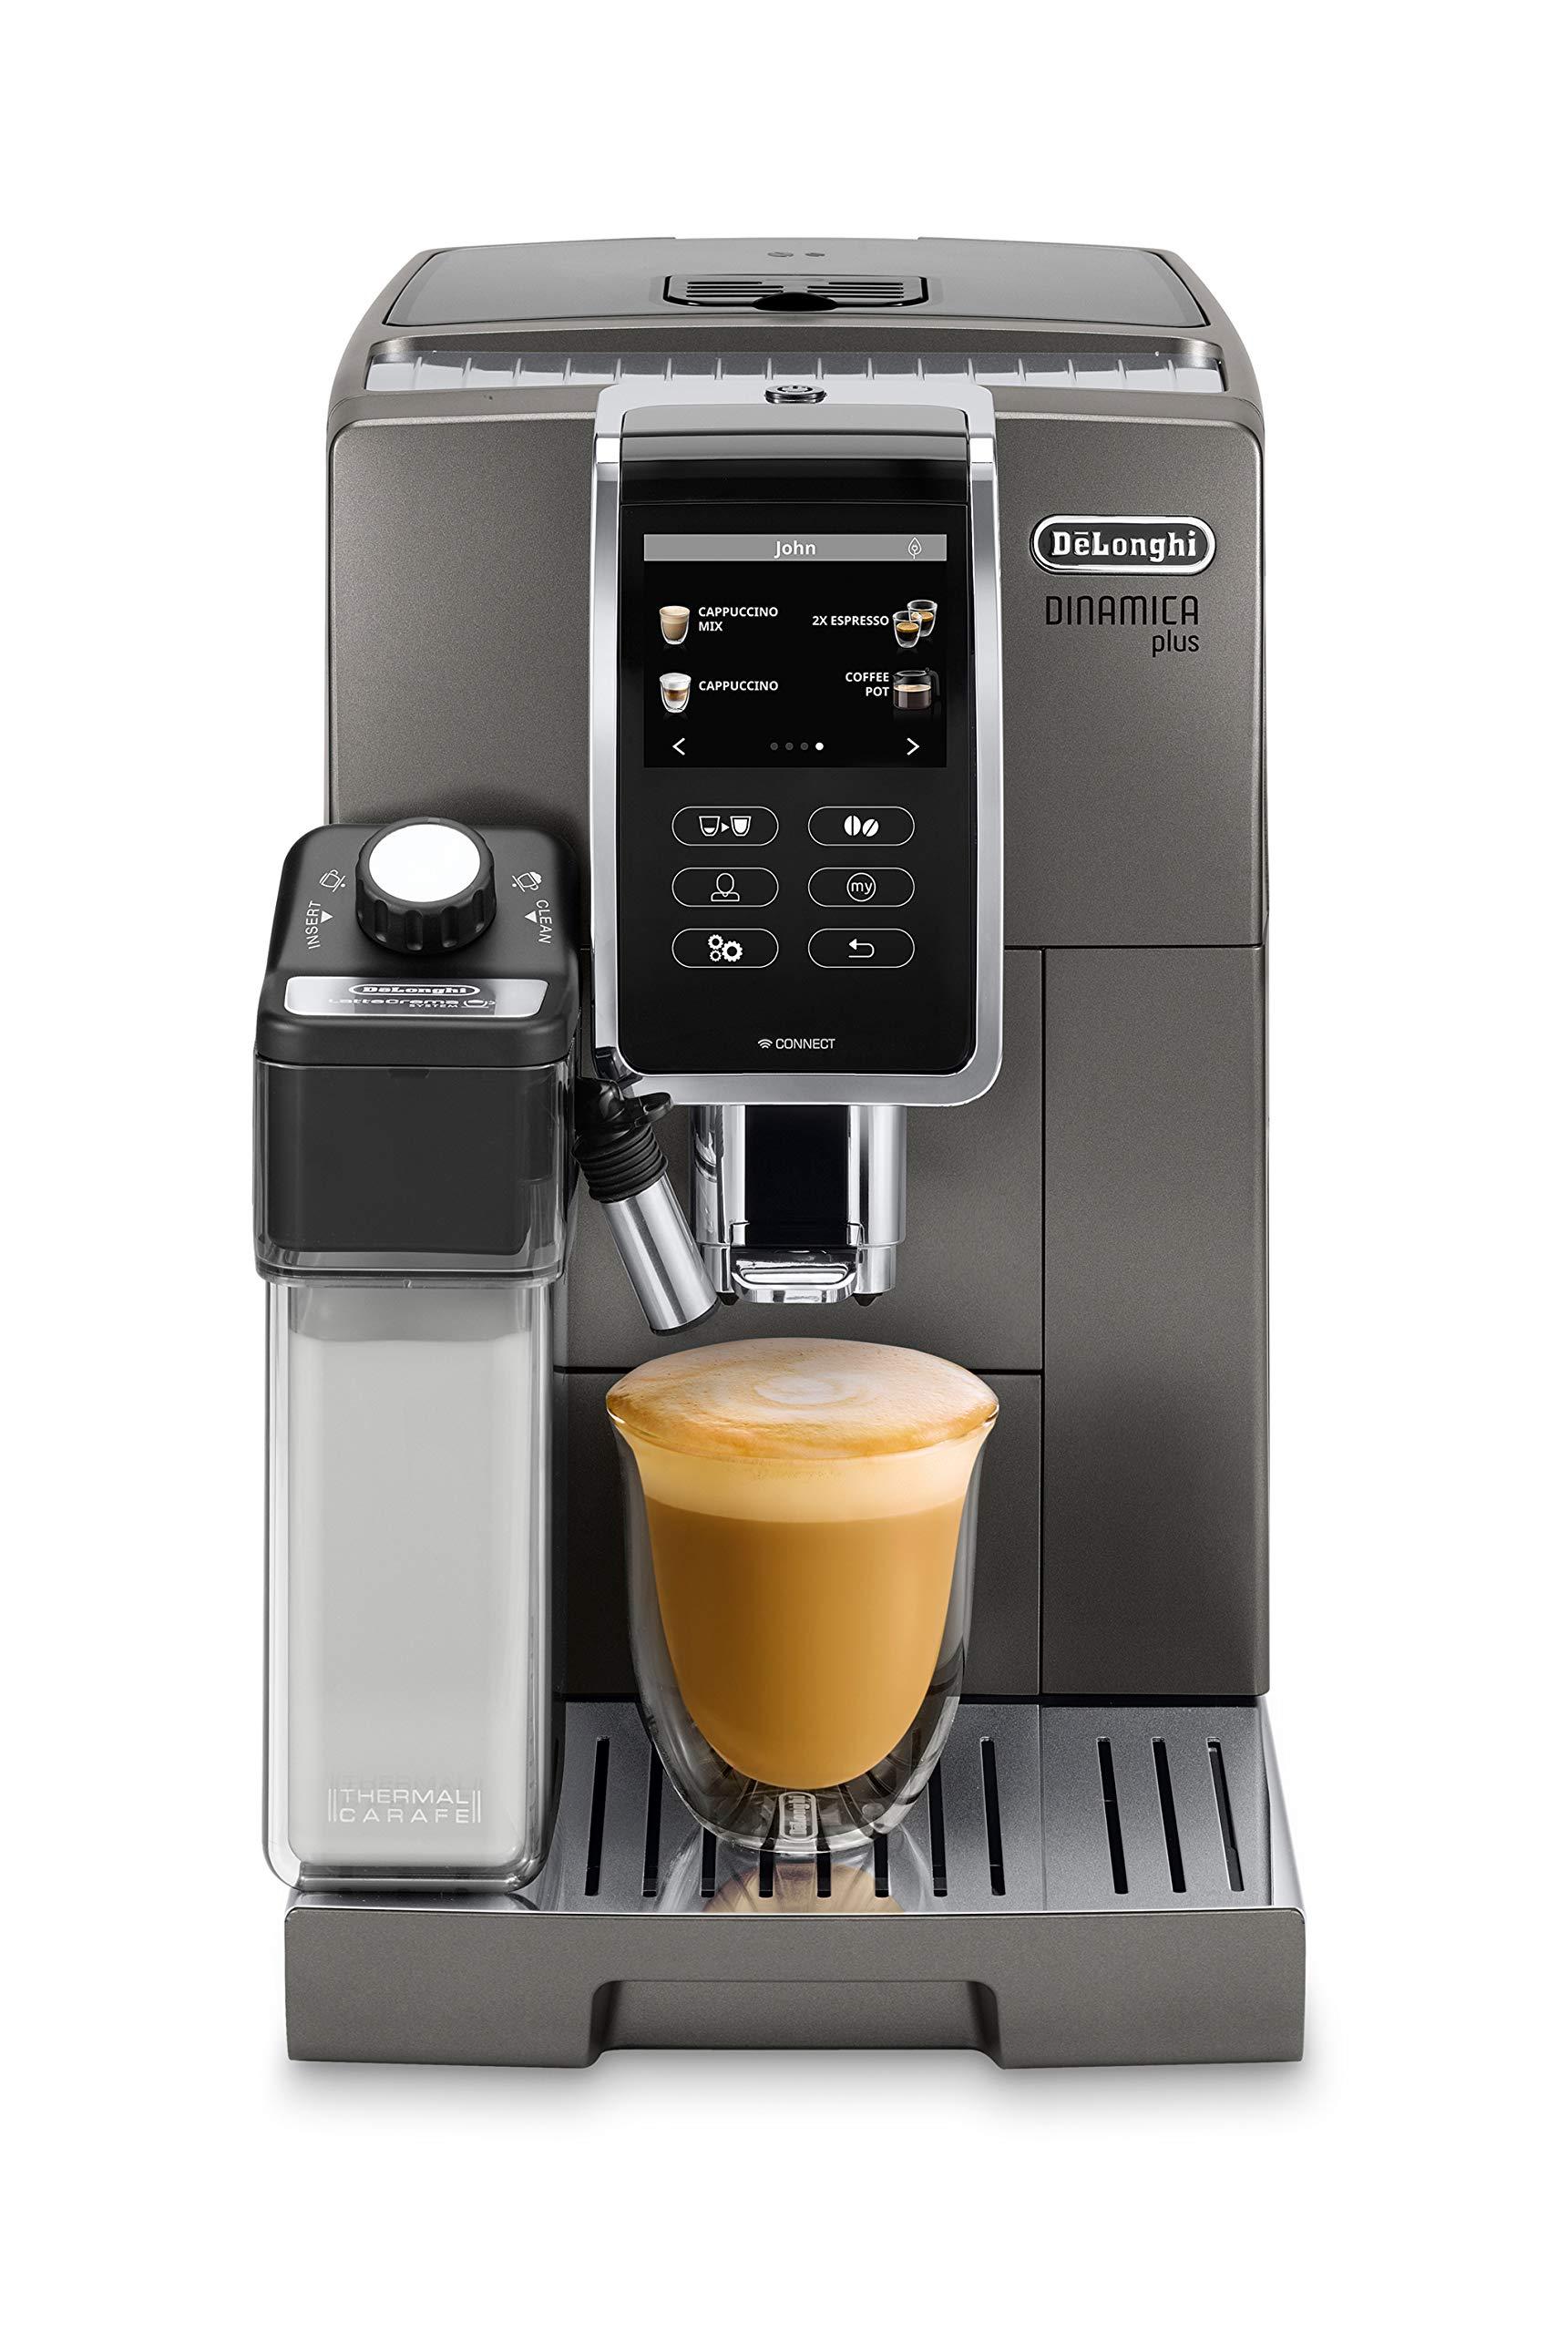 De'Longhi ECAM 370.95.T Dinamica Plus Kaffeevollautomat mit App